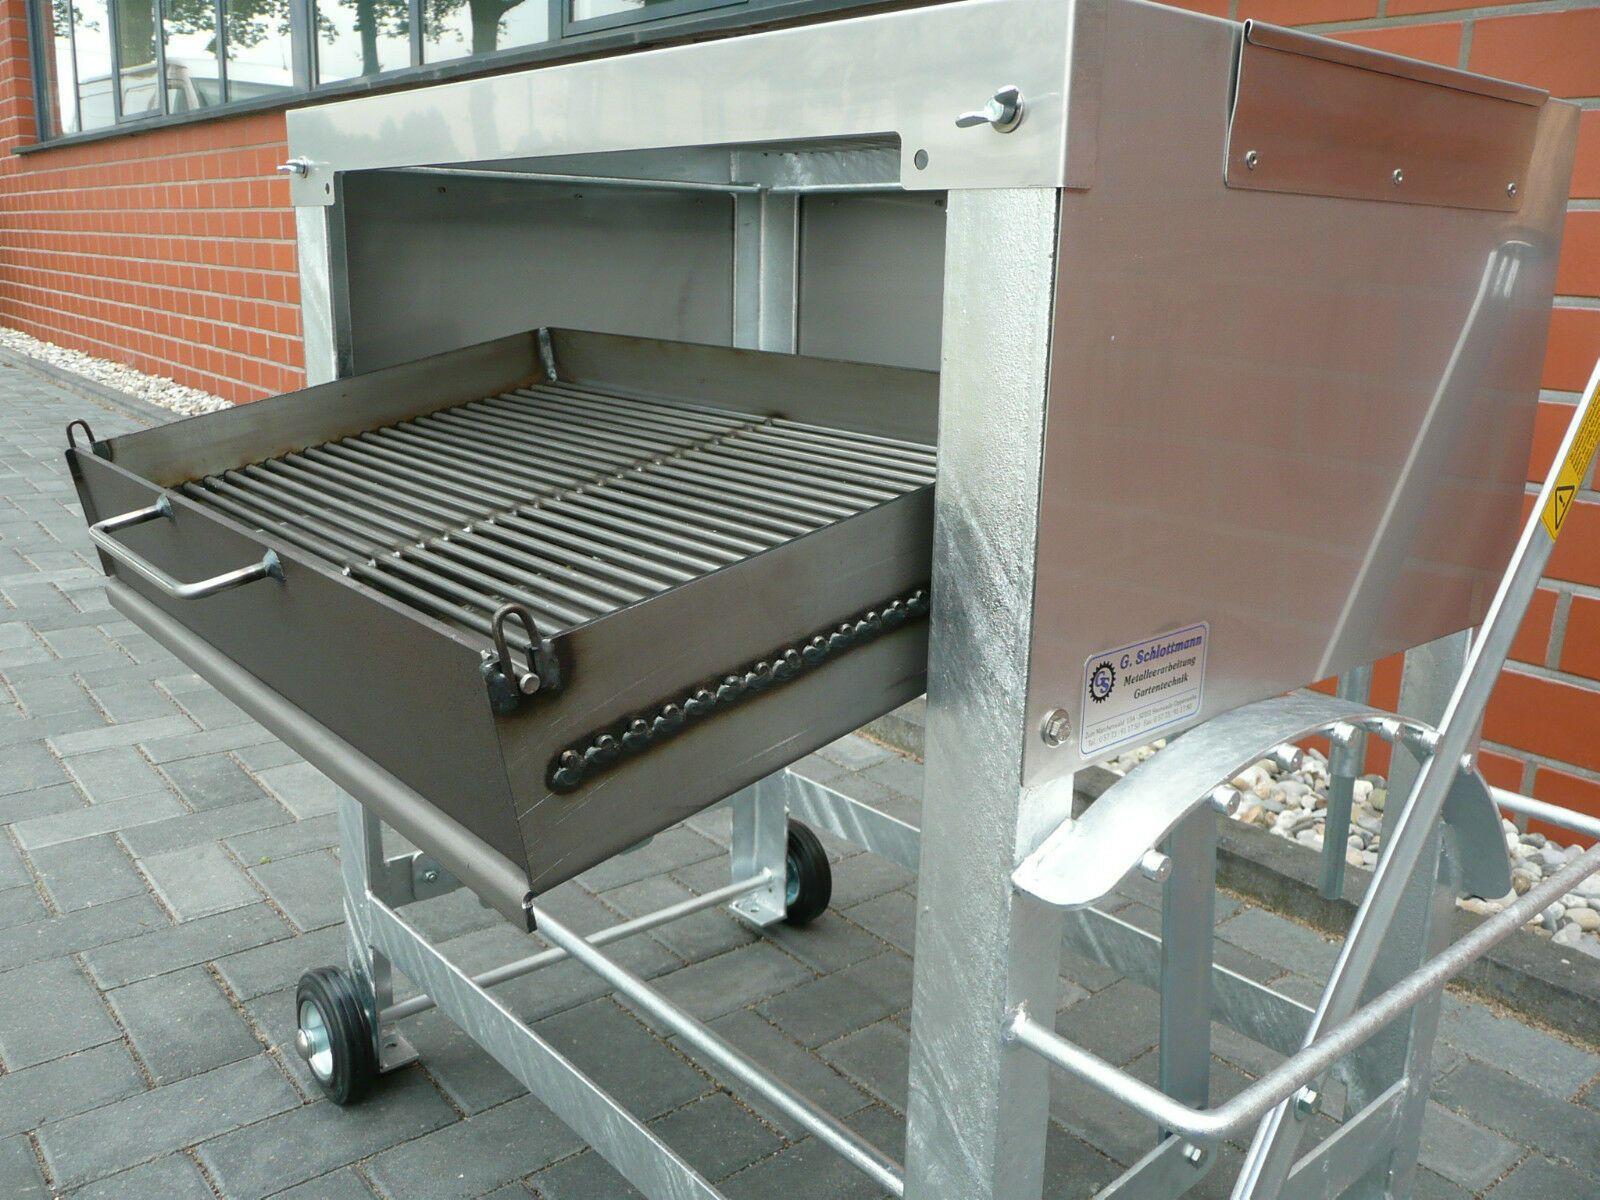 46+ Edelstahl grill selber bauen Trends